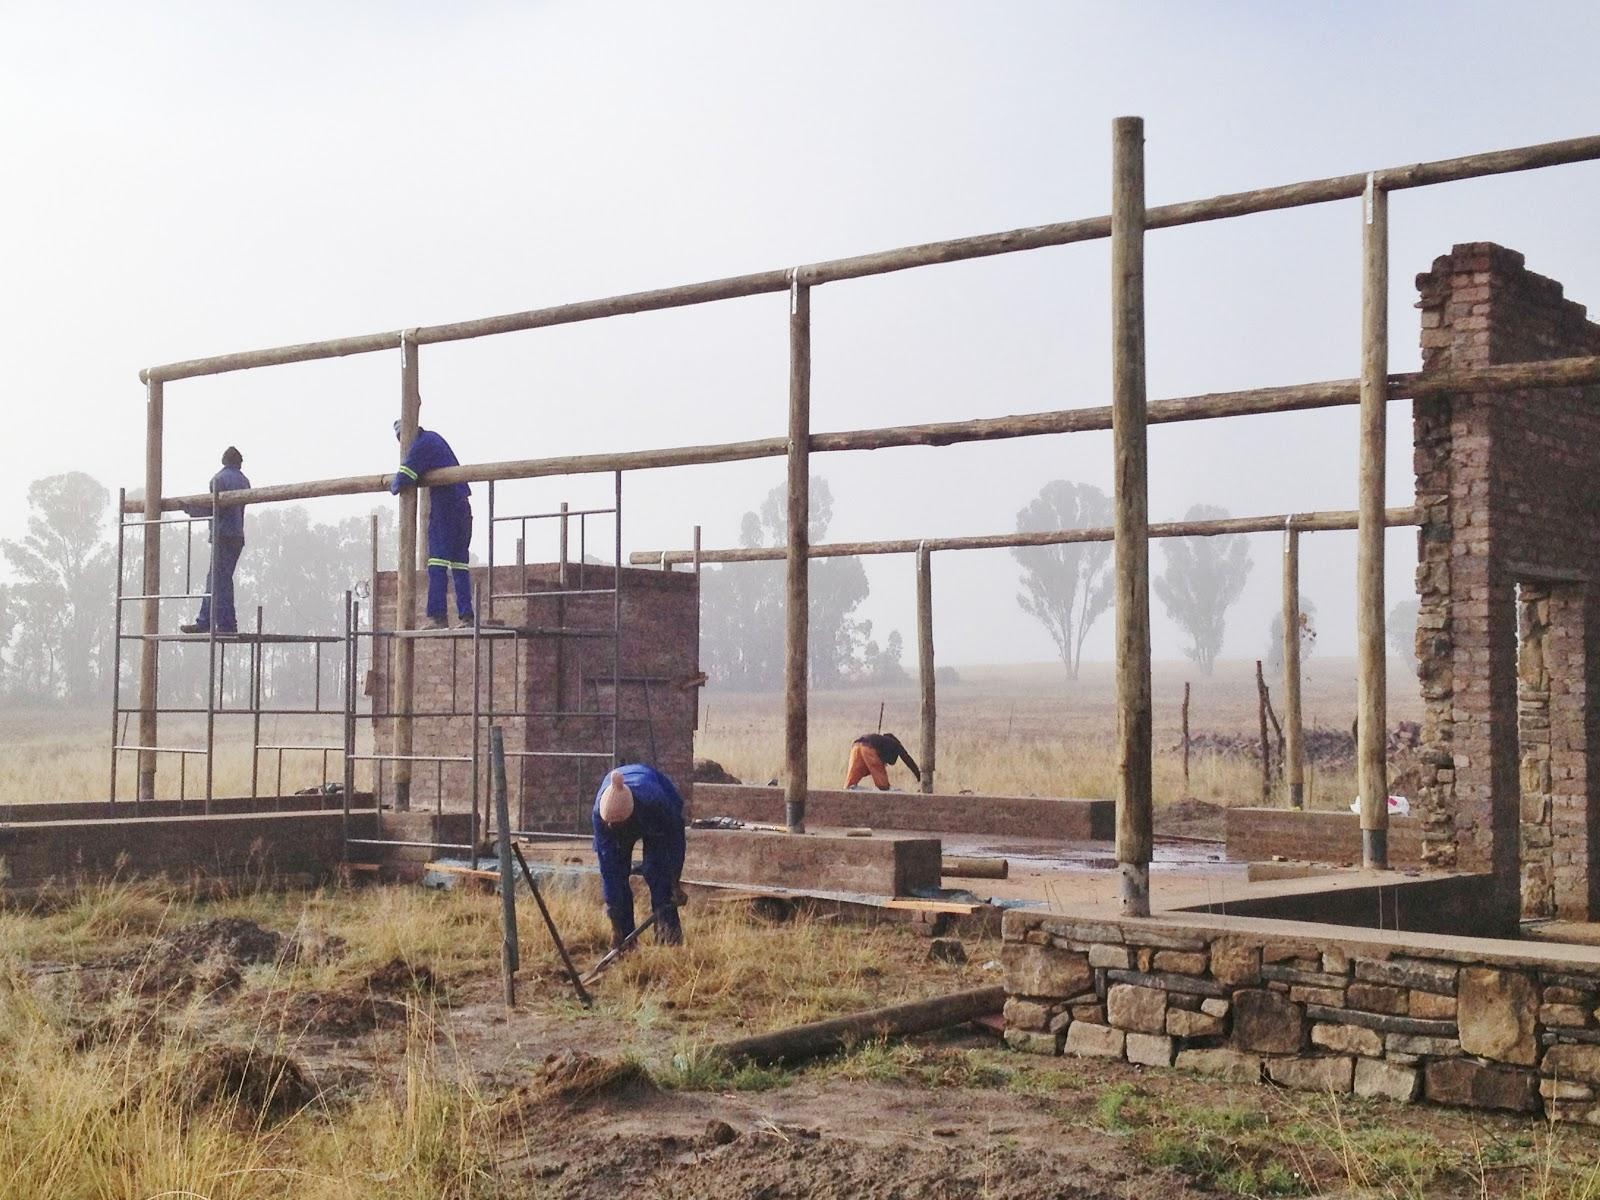 Deneys Farm : Diary of a Straw Bale Building Project